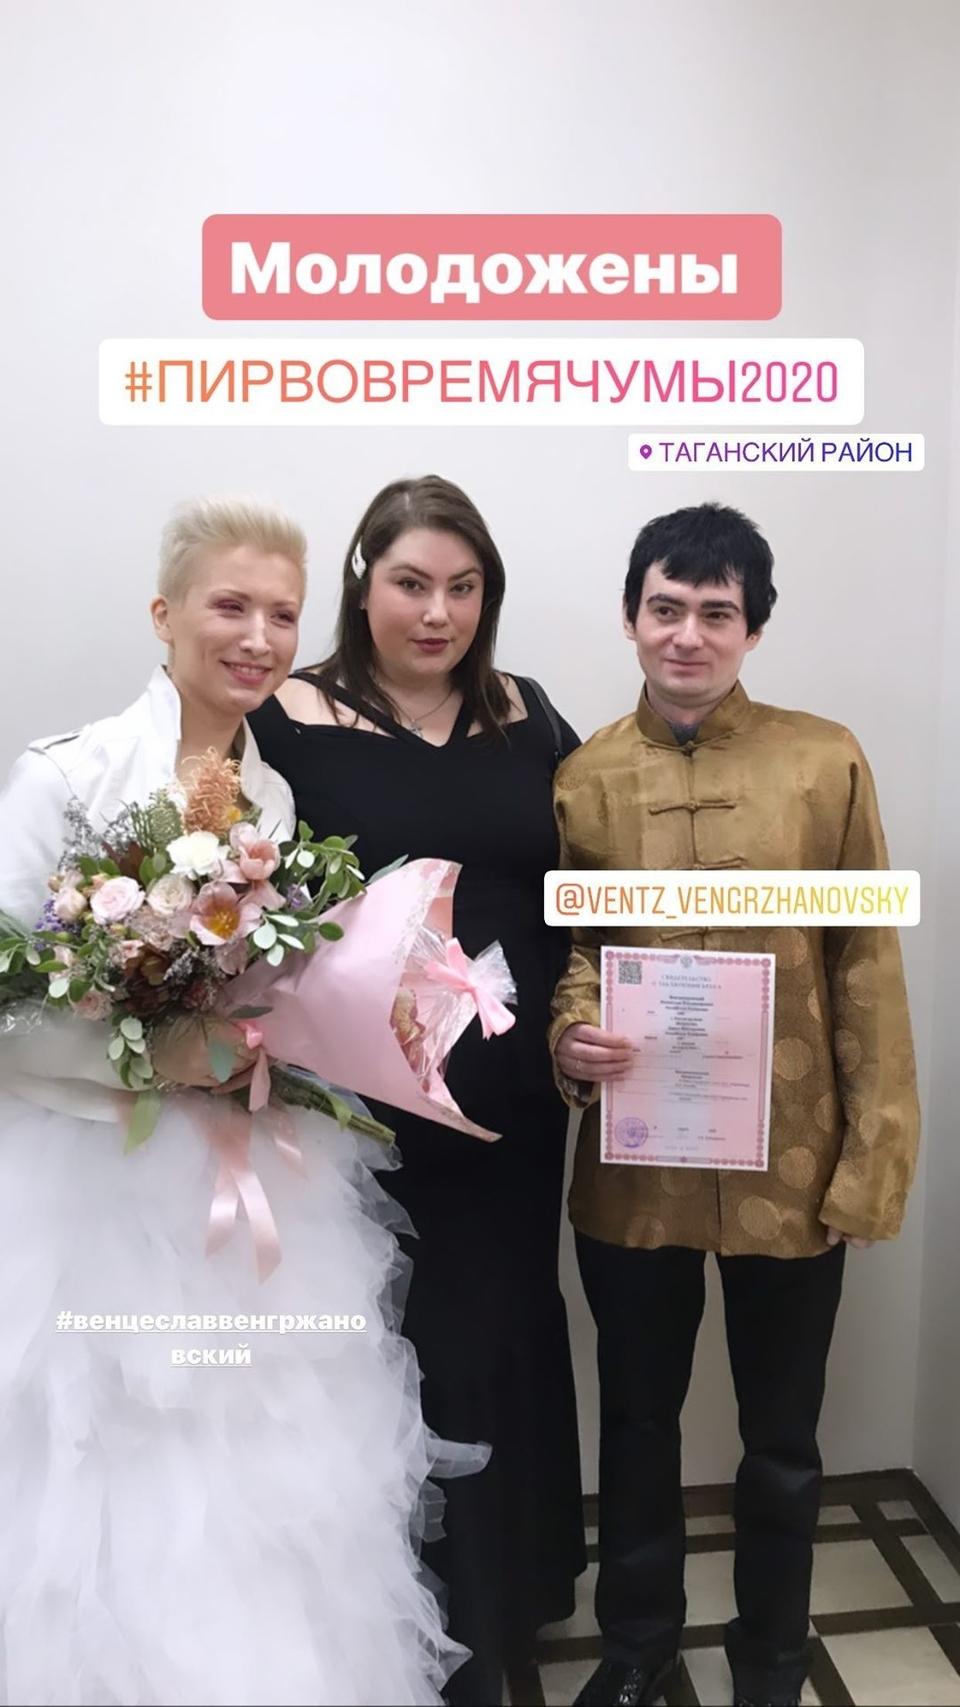 Венцеслав предъявил общественности свидетельство орегистрации брака ?Фото: «Инстаграм»